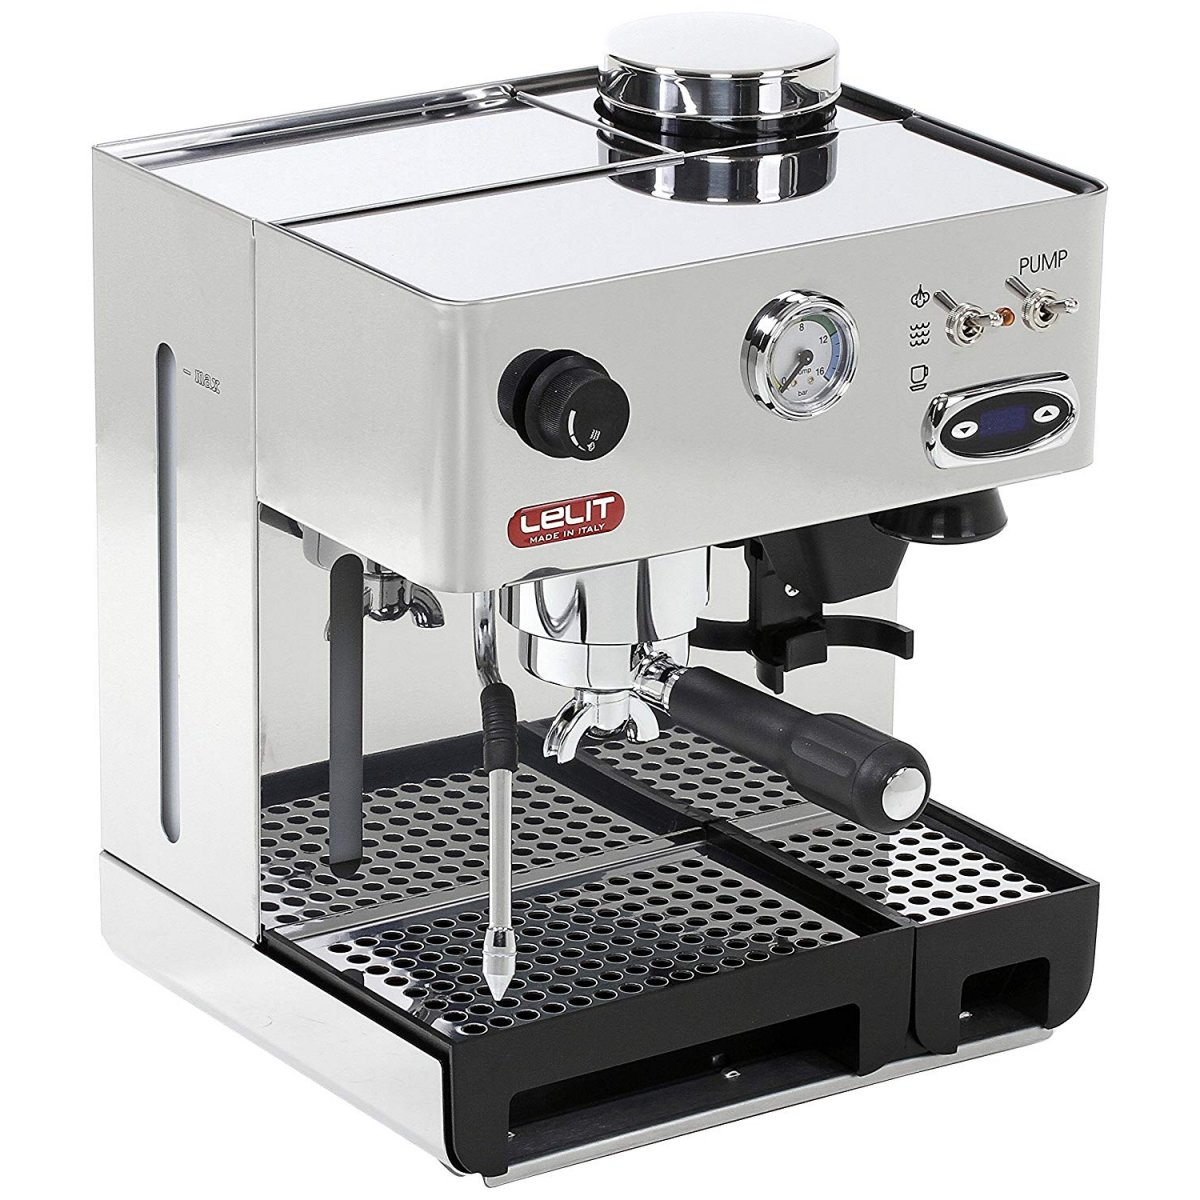 LELIT MACCHINA CAFFÈ ANNA LELIT PL042TEMD